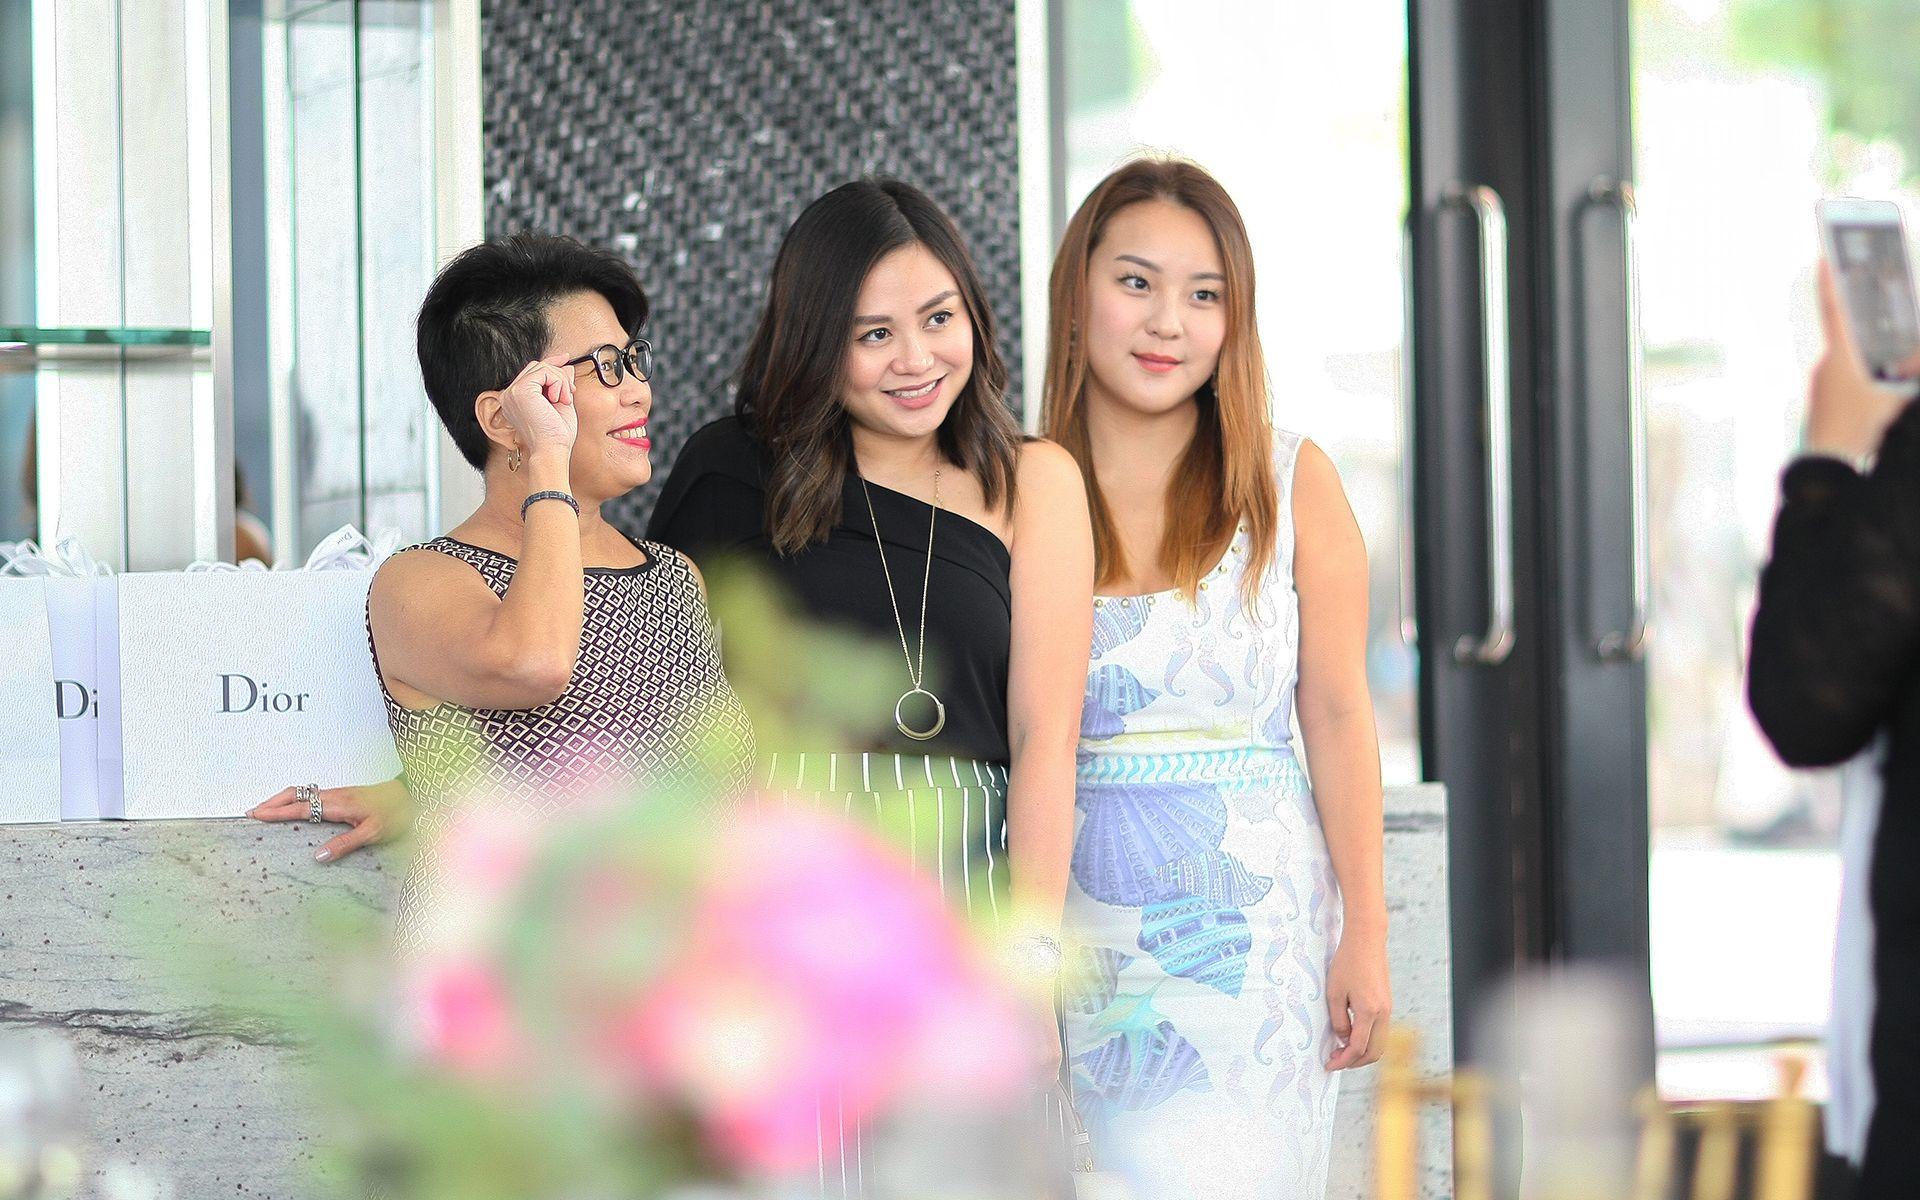 Elizabeth Soong, Jenn Low and Valerie Ong